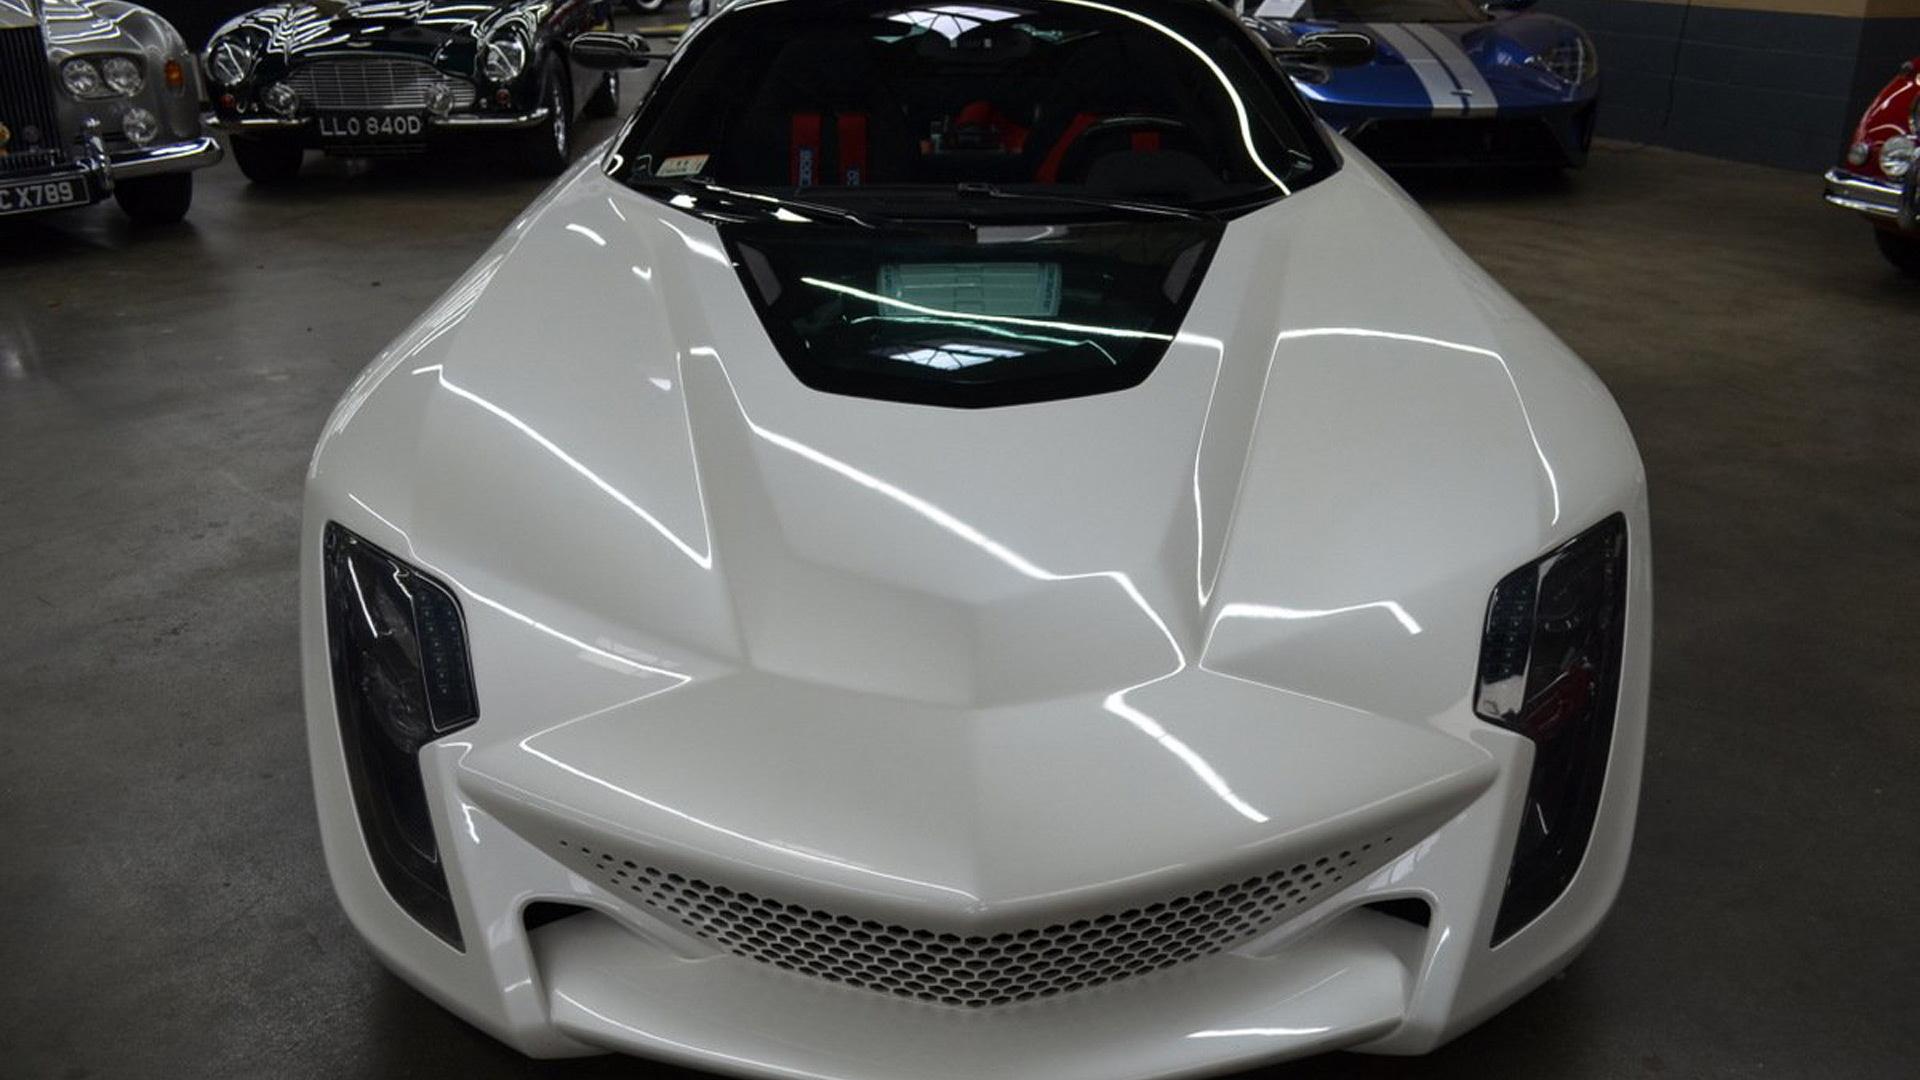 Bertone Mantide - Photo credit: Autosport Designs